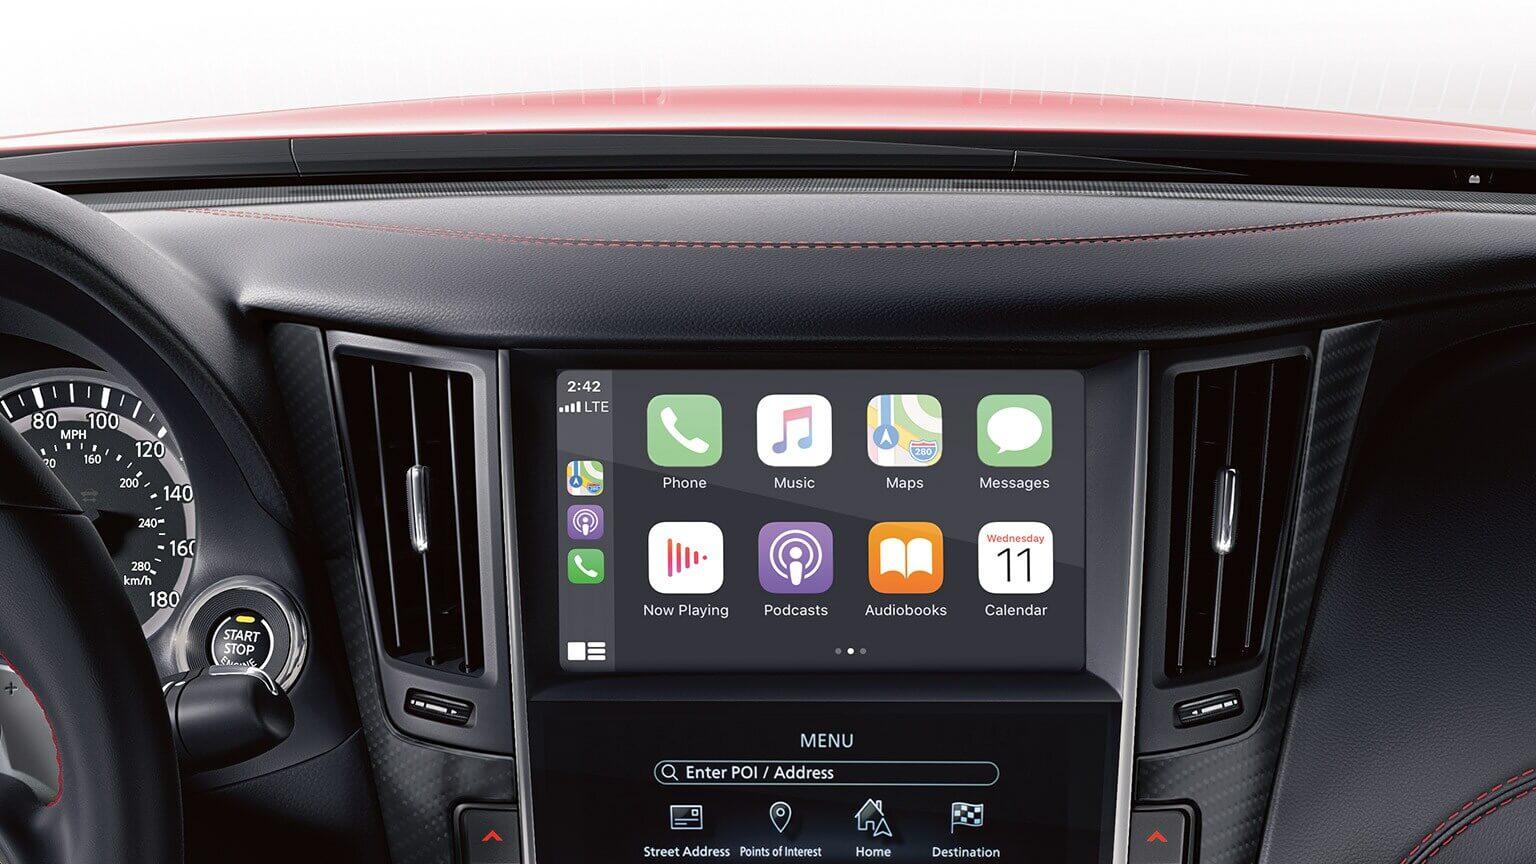 2021 Infiniti Q60 with apple carplay